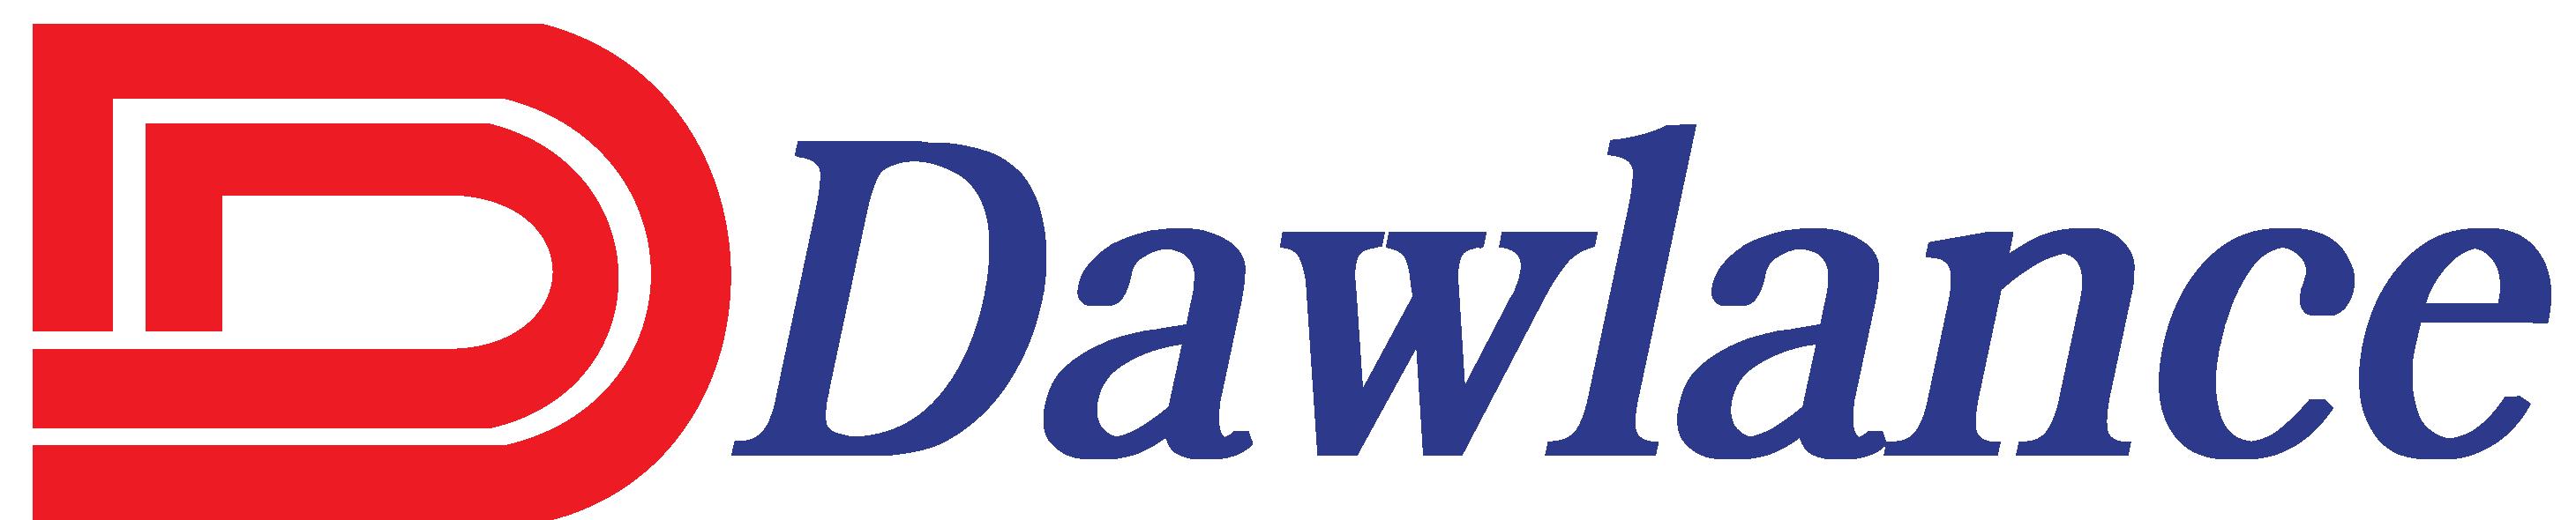 dawlance1